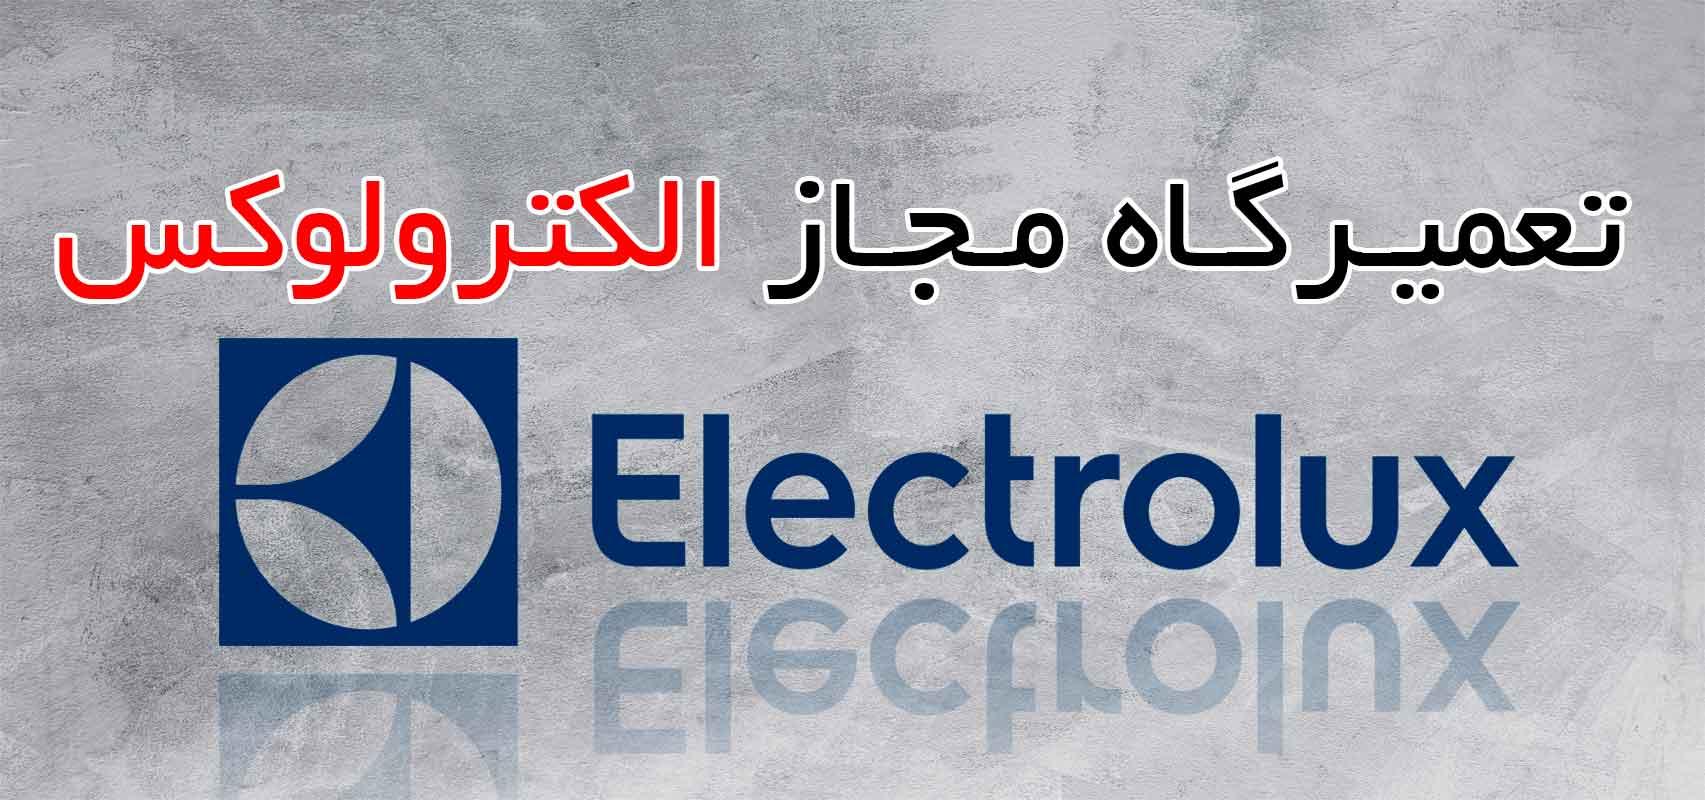 تعمیرگاه مجاز محصولات الکترولوکس